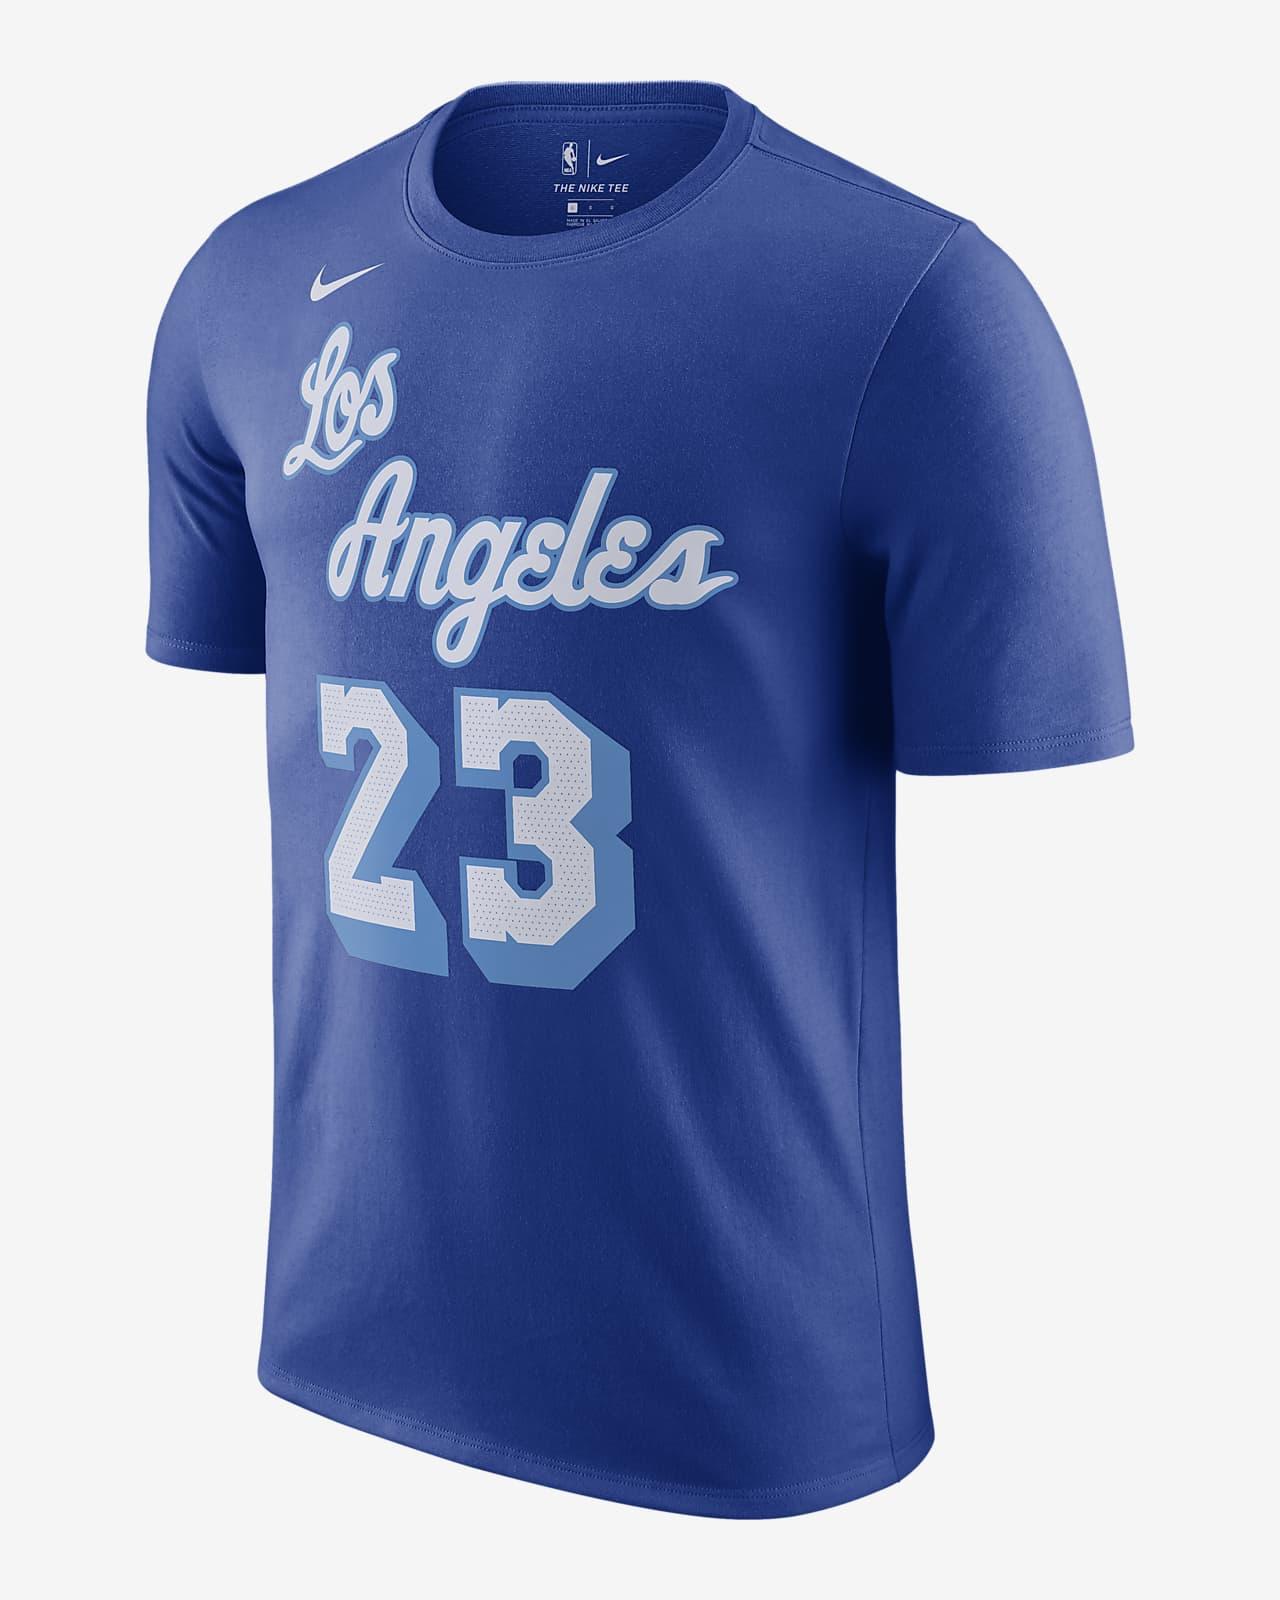 Los Angeles Lakers Classic Edition Nike NBA-herenshirt